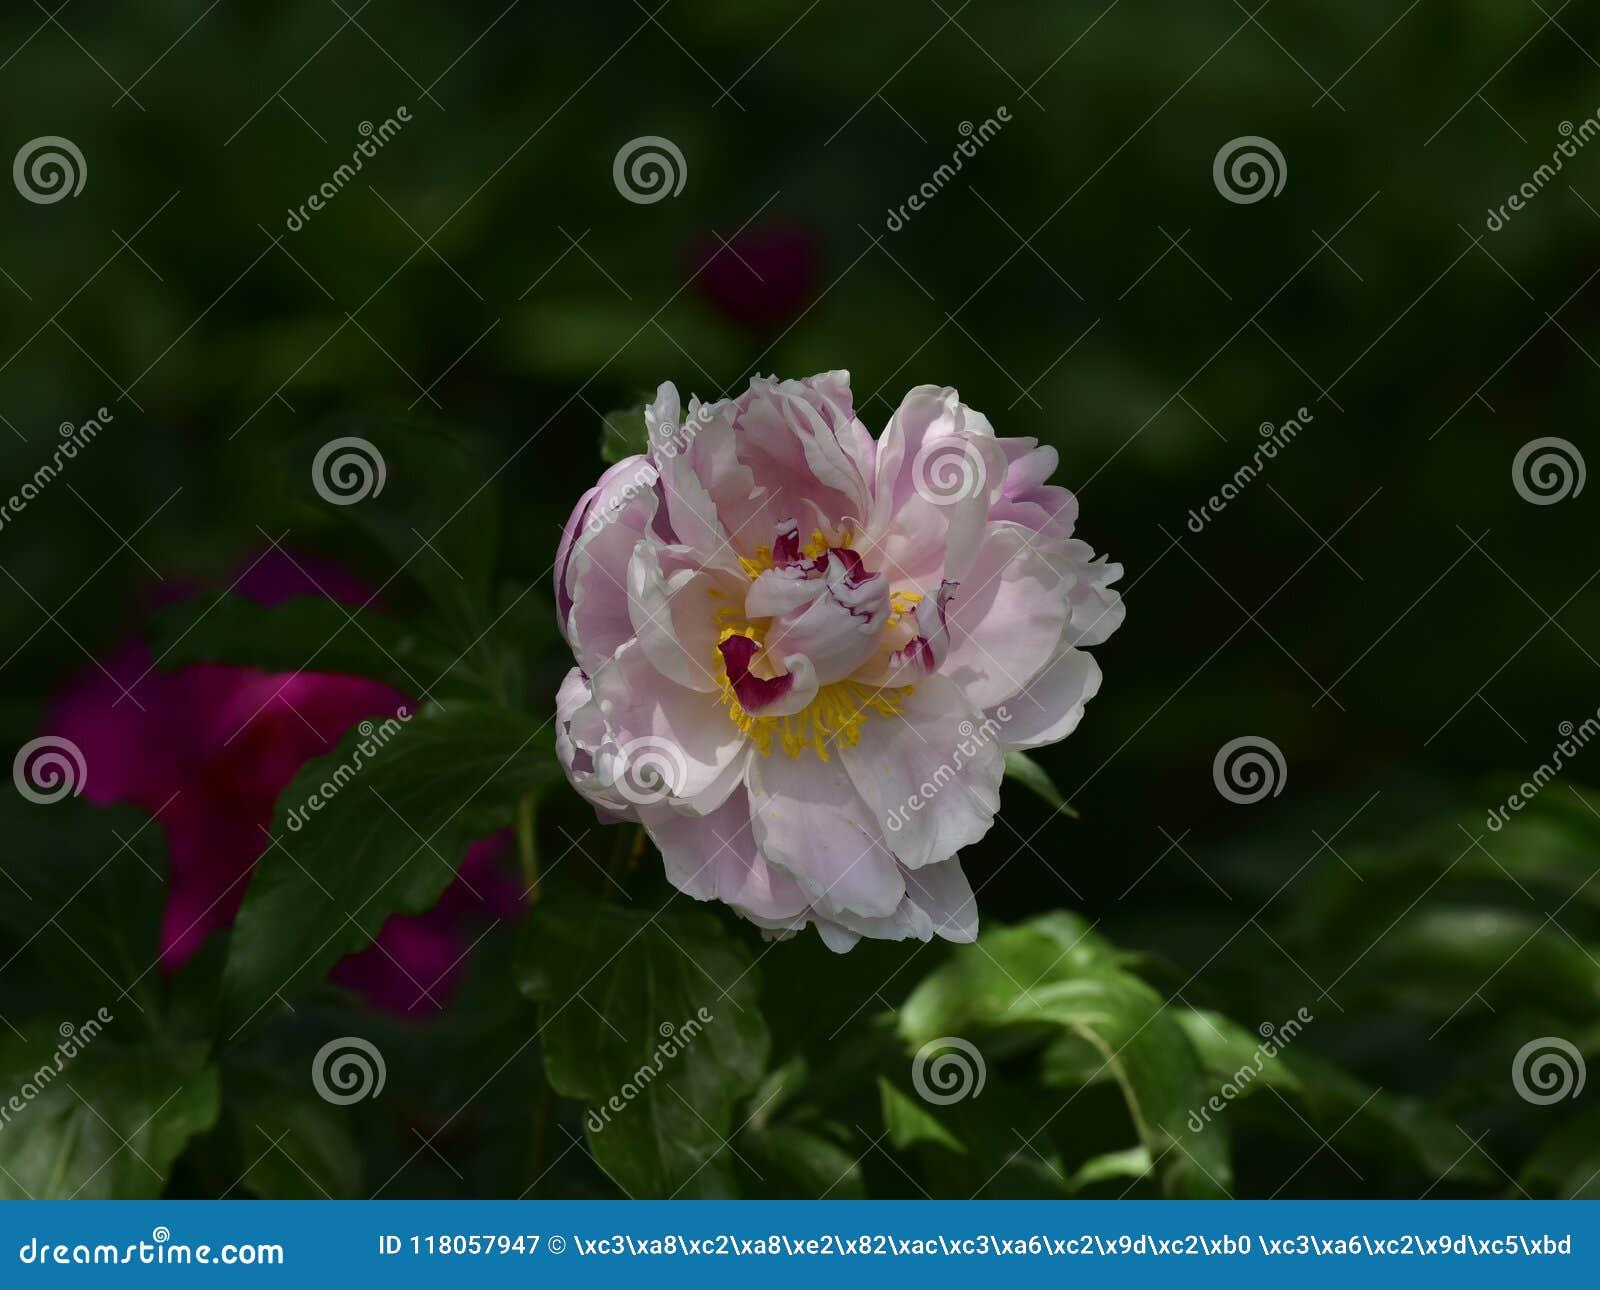 Paeonia Lactiflora Scientific Name Paeonia Lactiflora Pall Prime